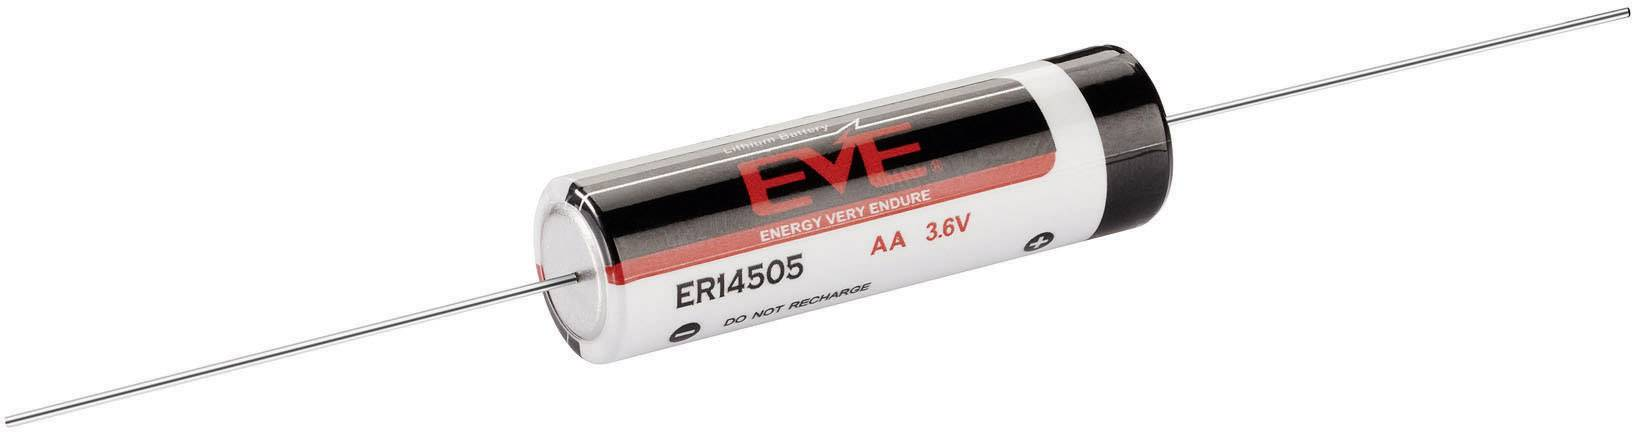 Lithiová batéria EVE, AA s pájokovacími pinmi, 2600 mAh